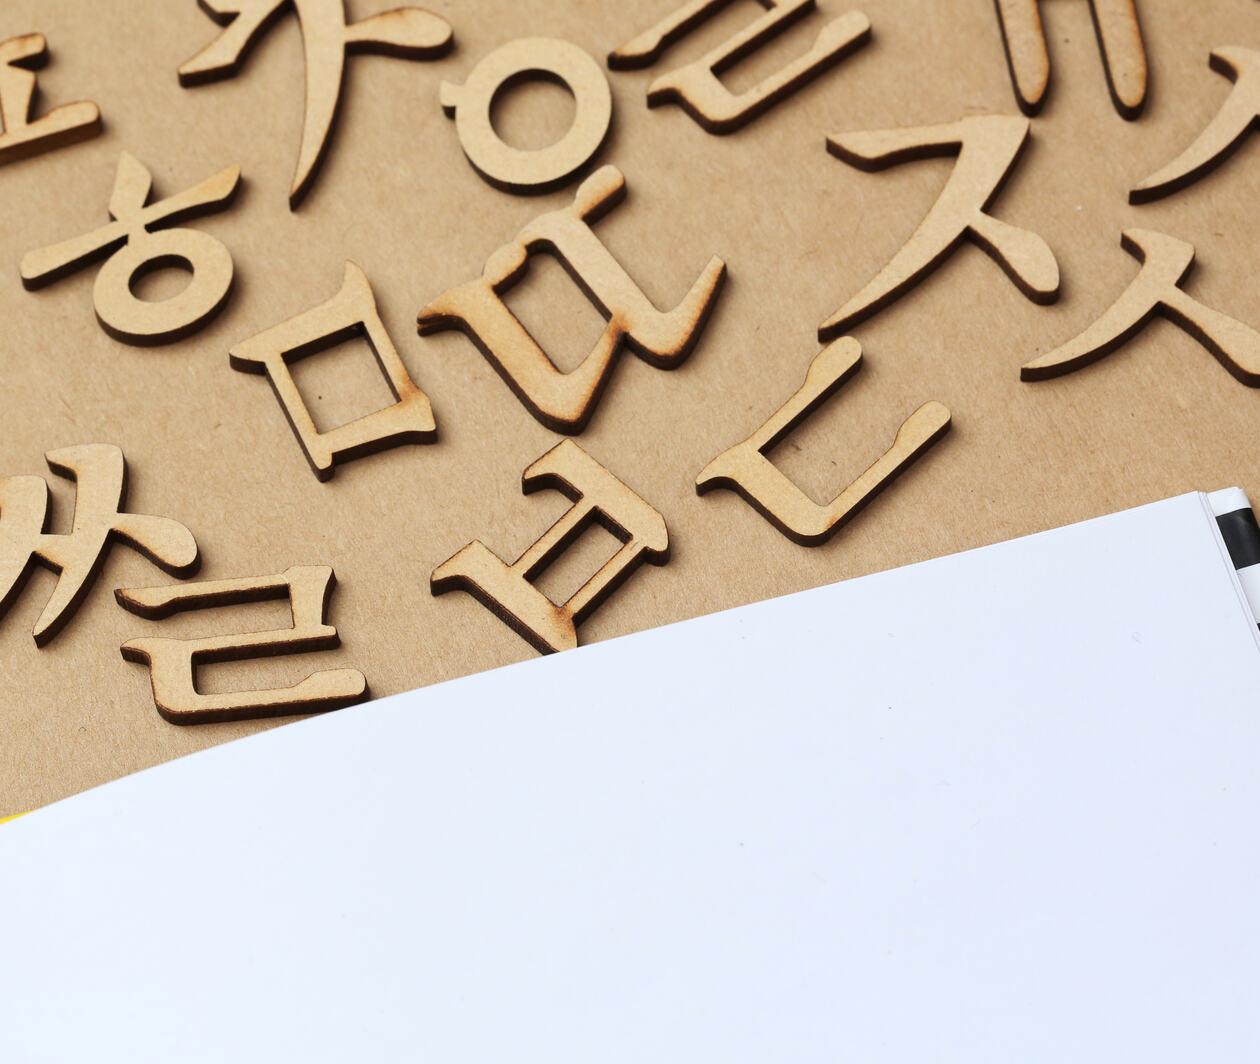 Intermediate Korean: Exploring the Language and Culture of Korea